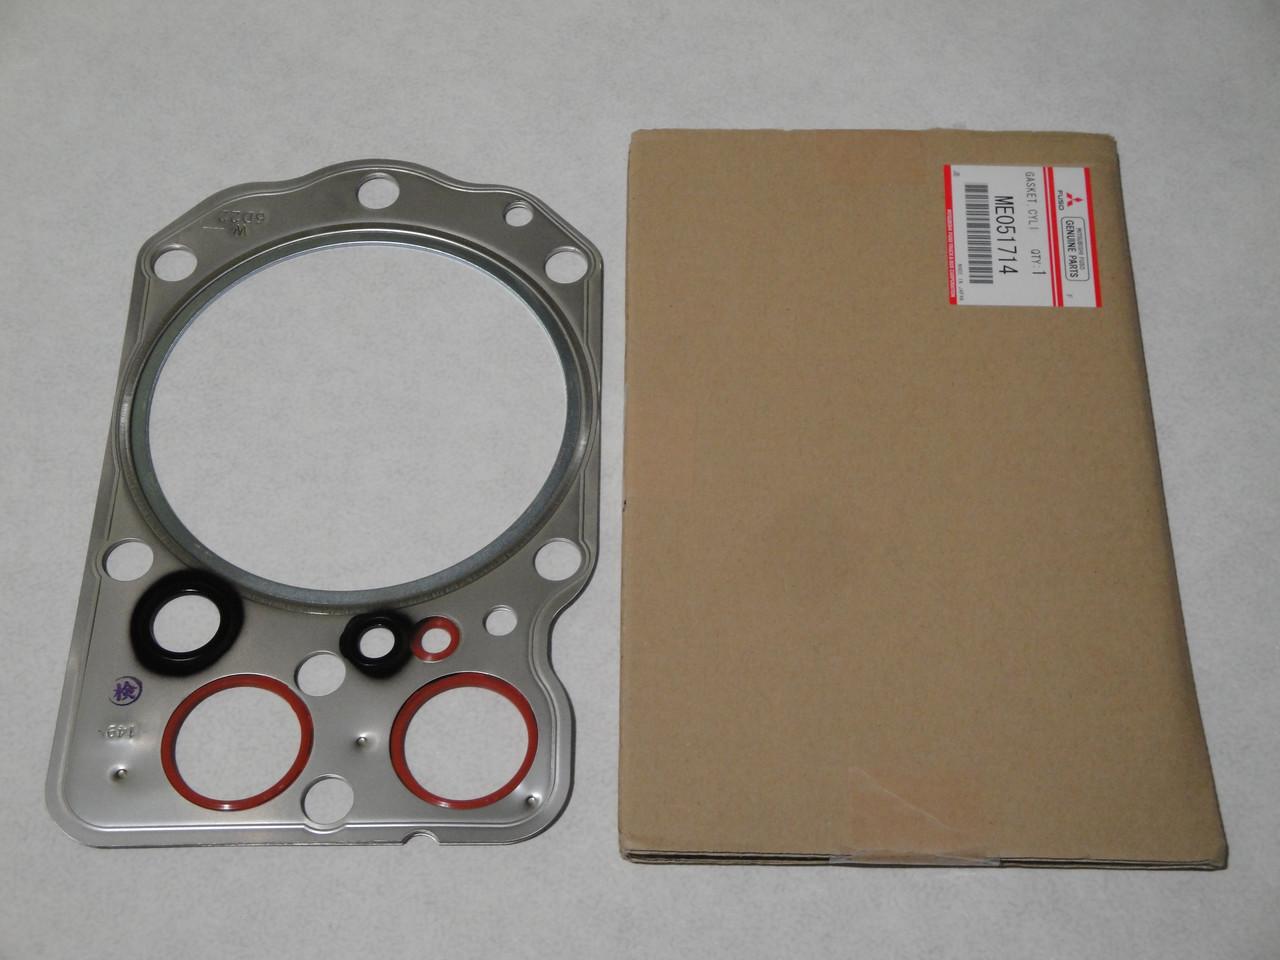 Прокладка головки двигуна MITSUBISHI SAFIR MS827 (MITSUBISHI 6D24T) (ME051714) MITSUBISHI